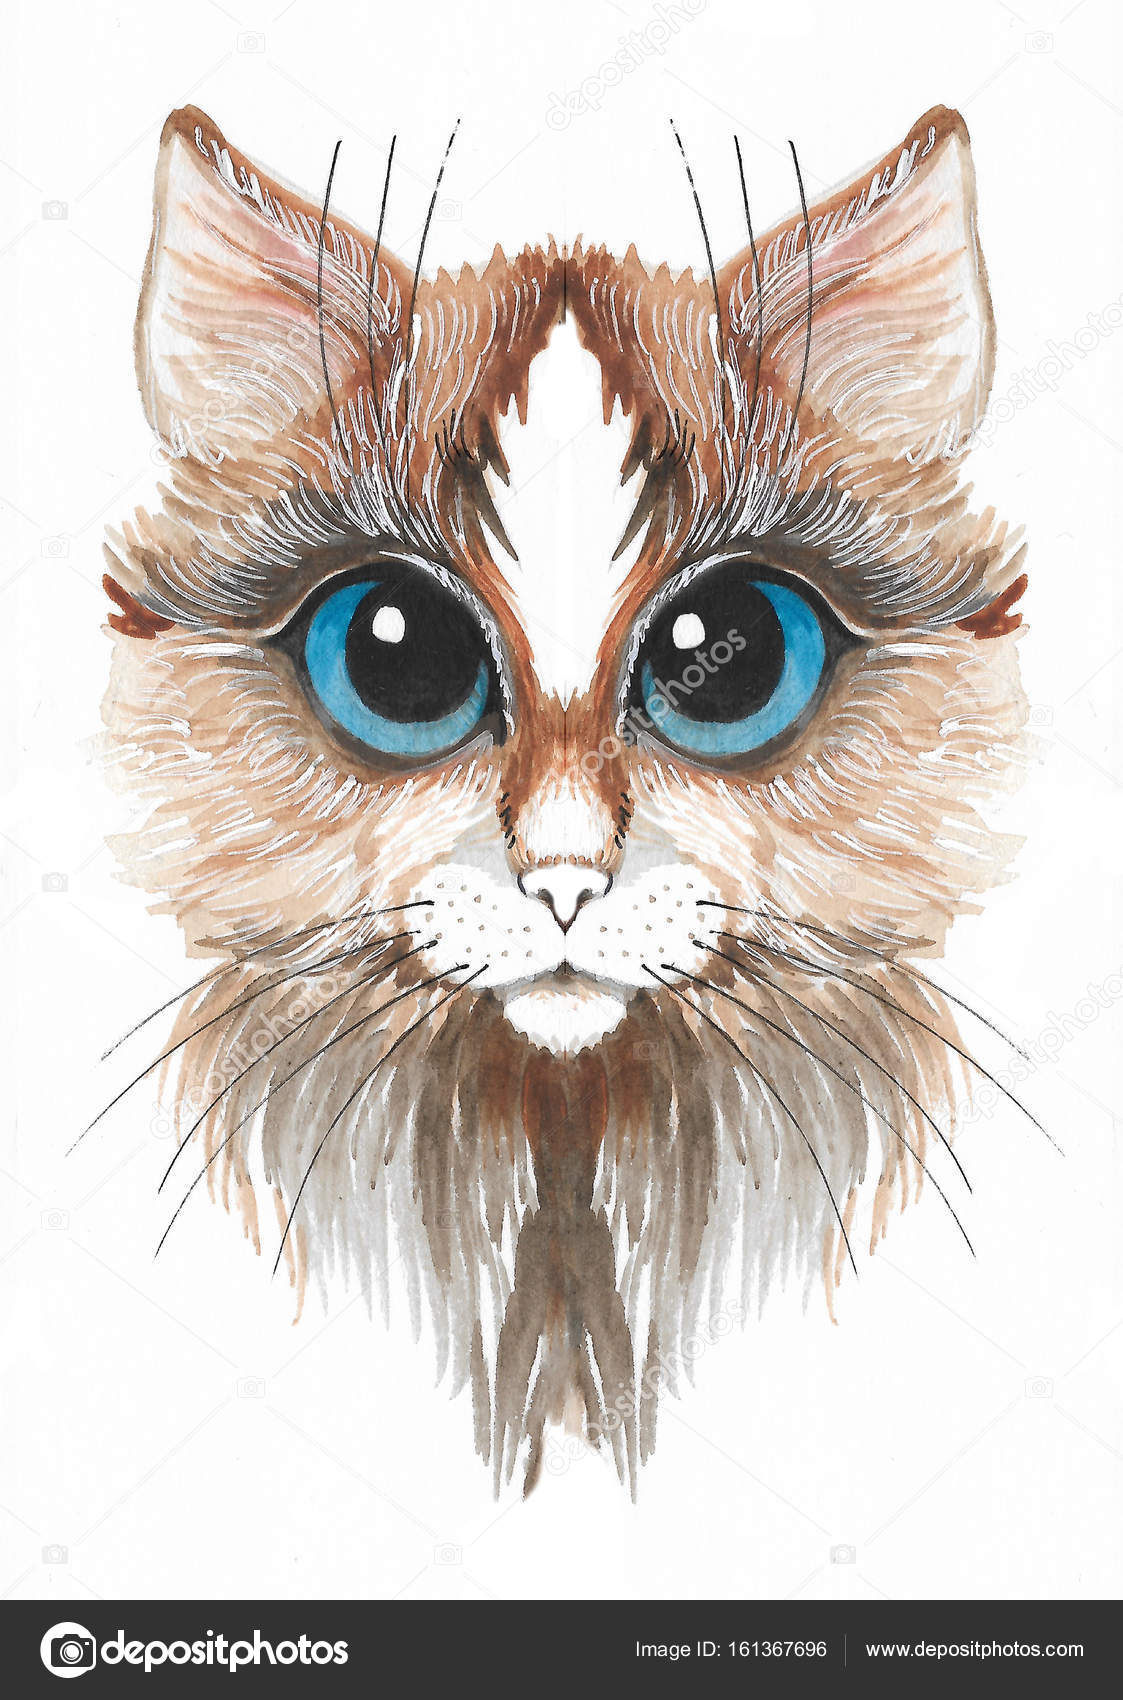 Süße Katze in Aquarell gemalt — Stockfoto © YuliaRey #161367696